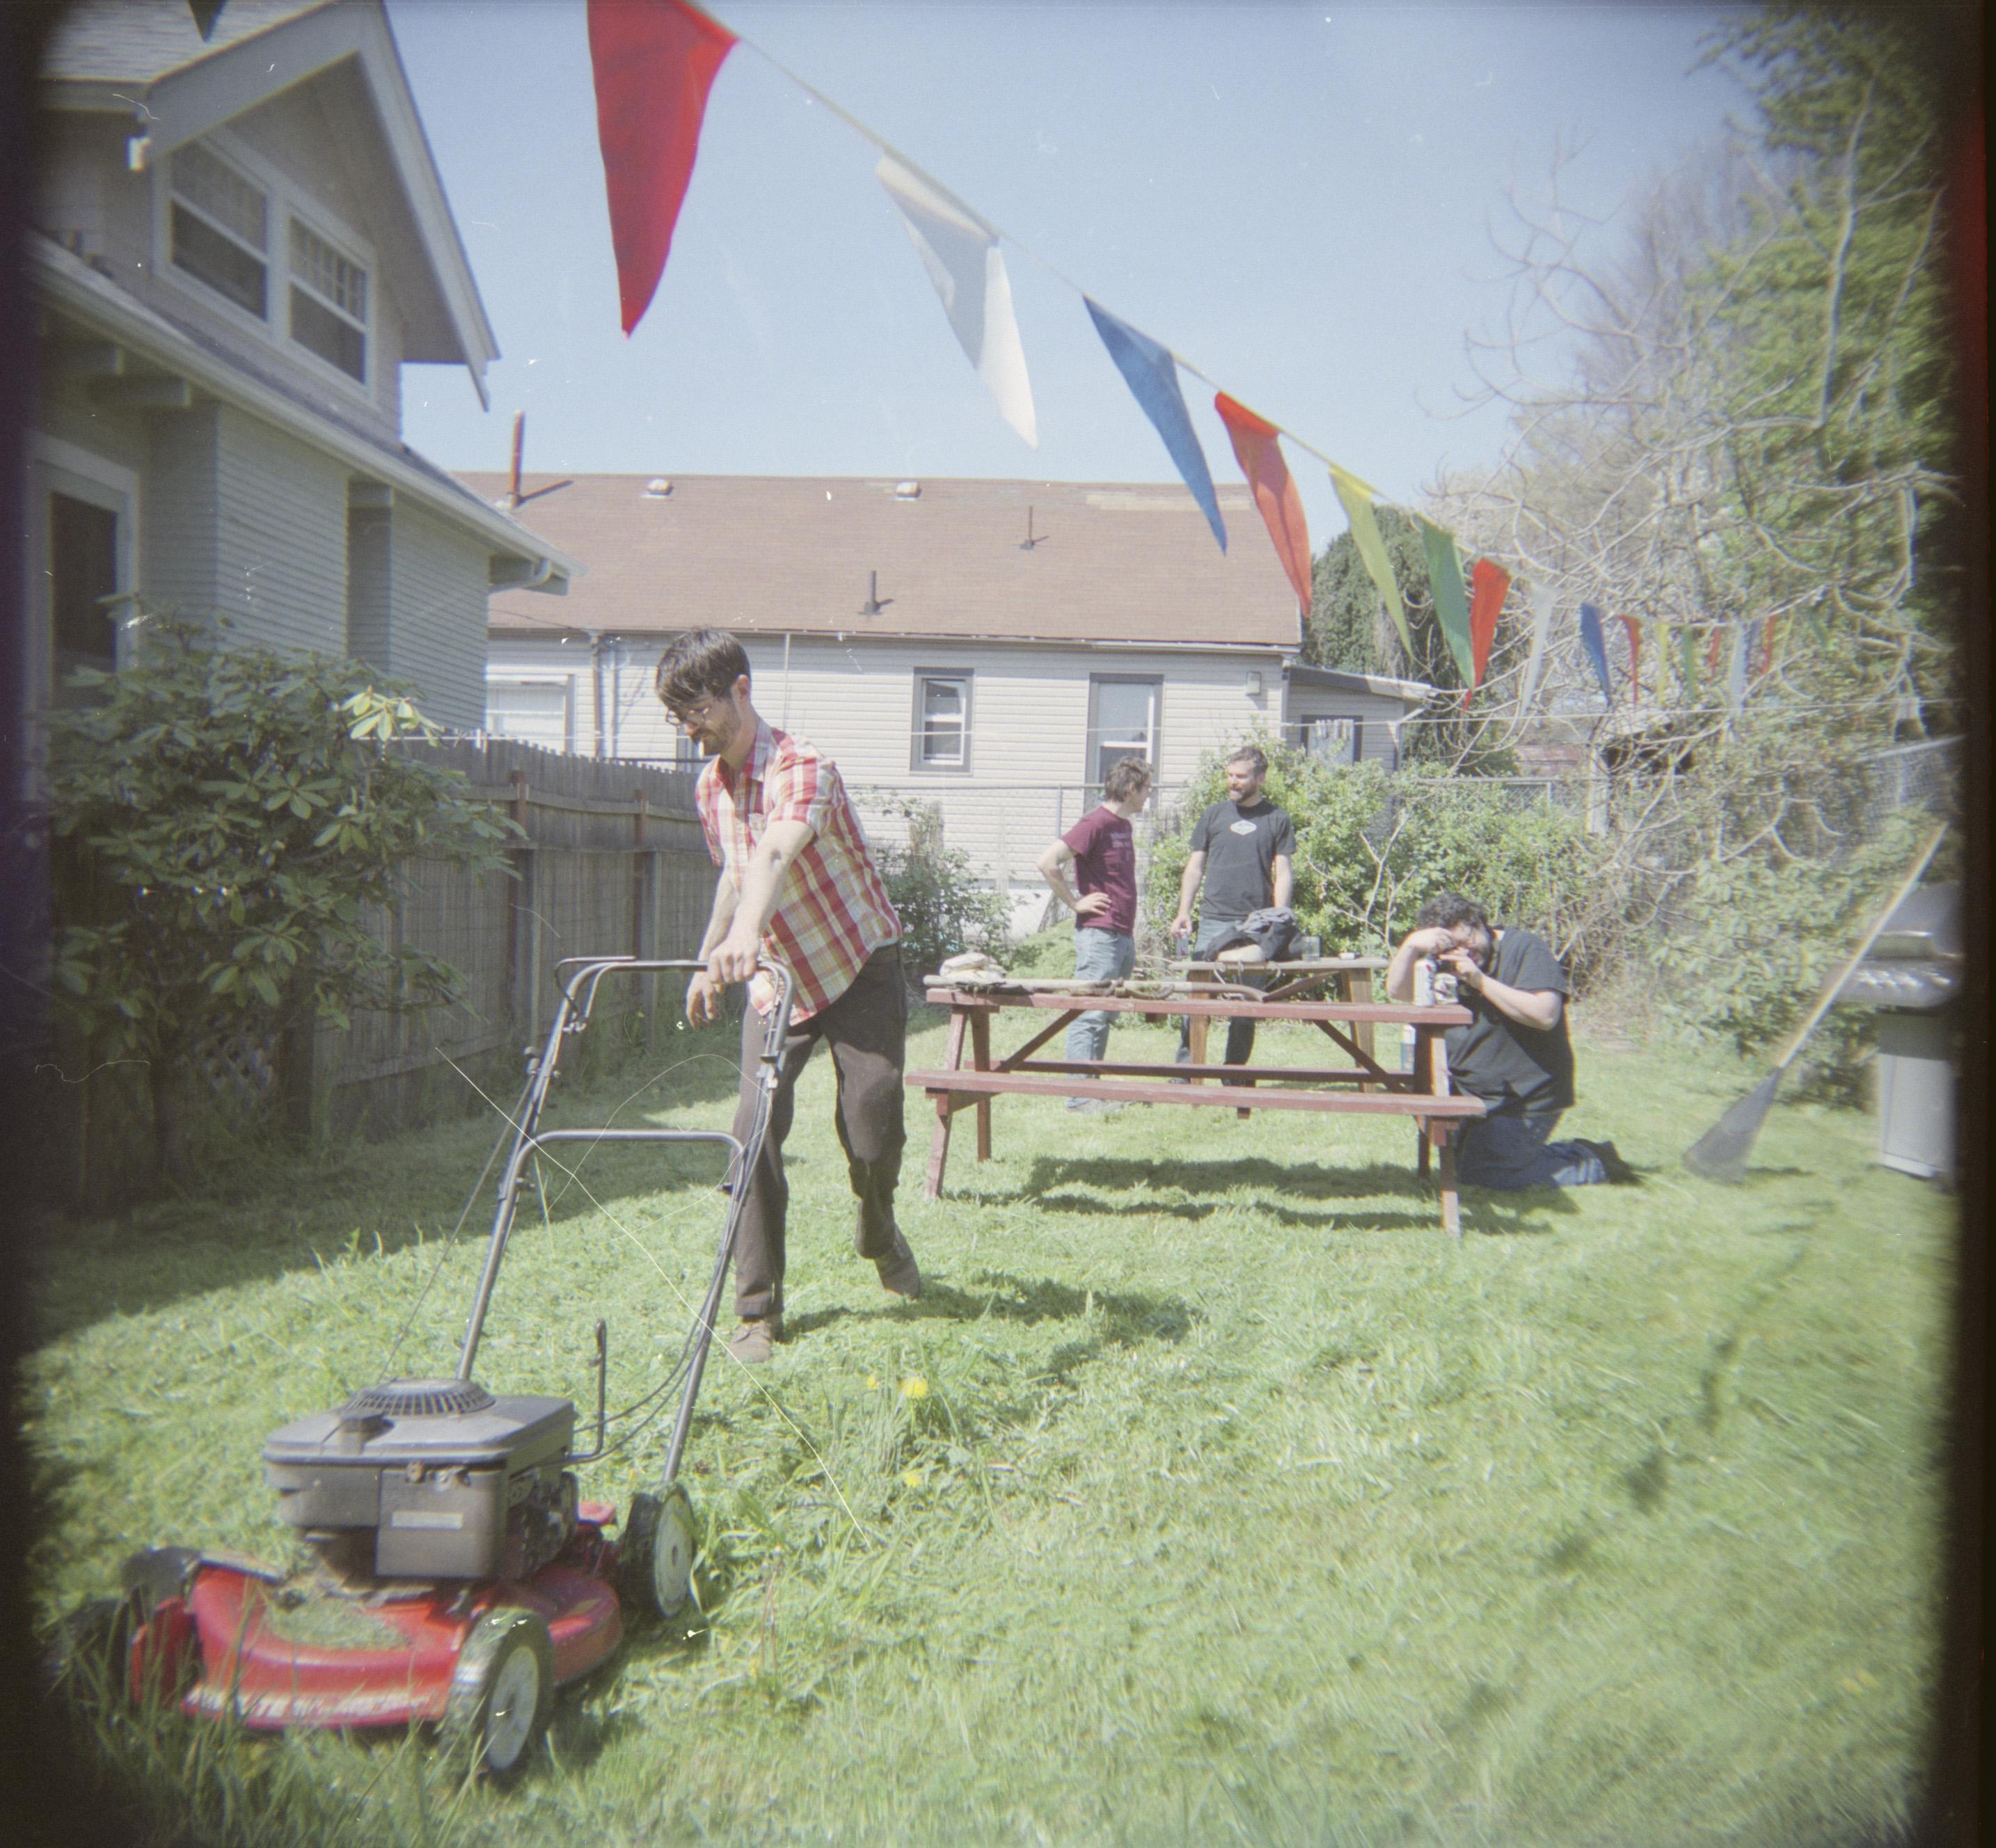 jeff mowing